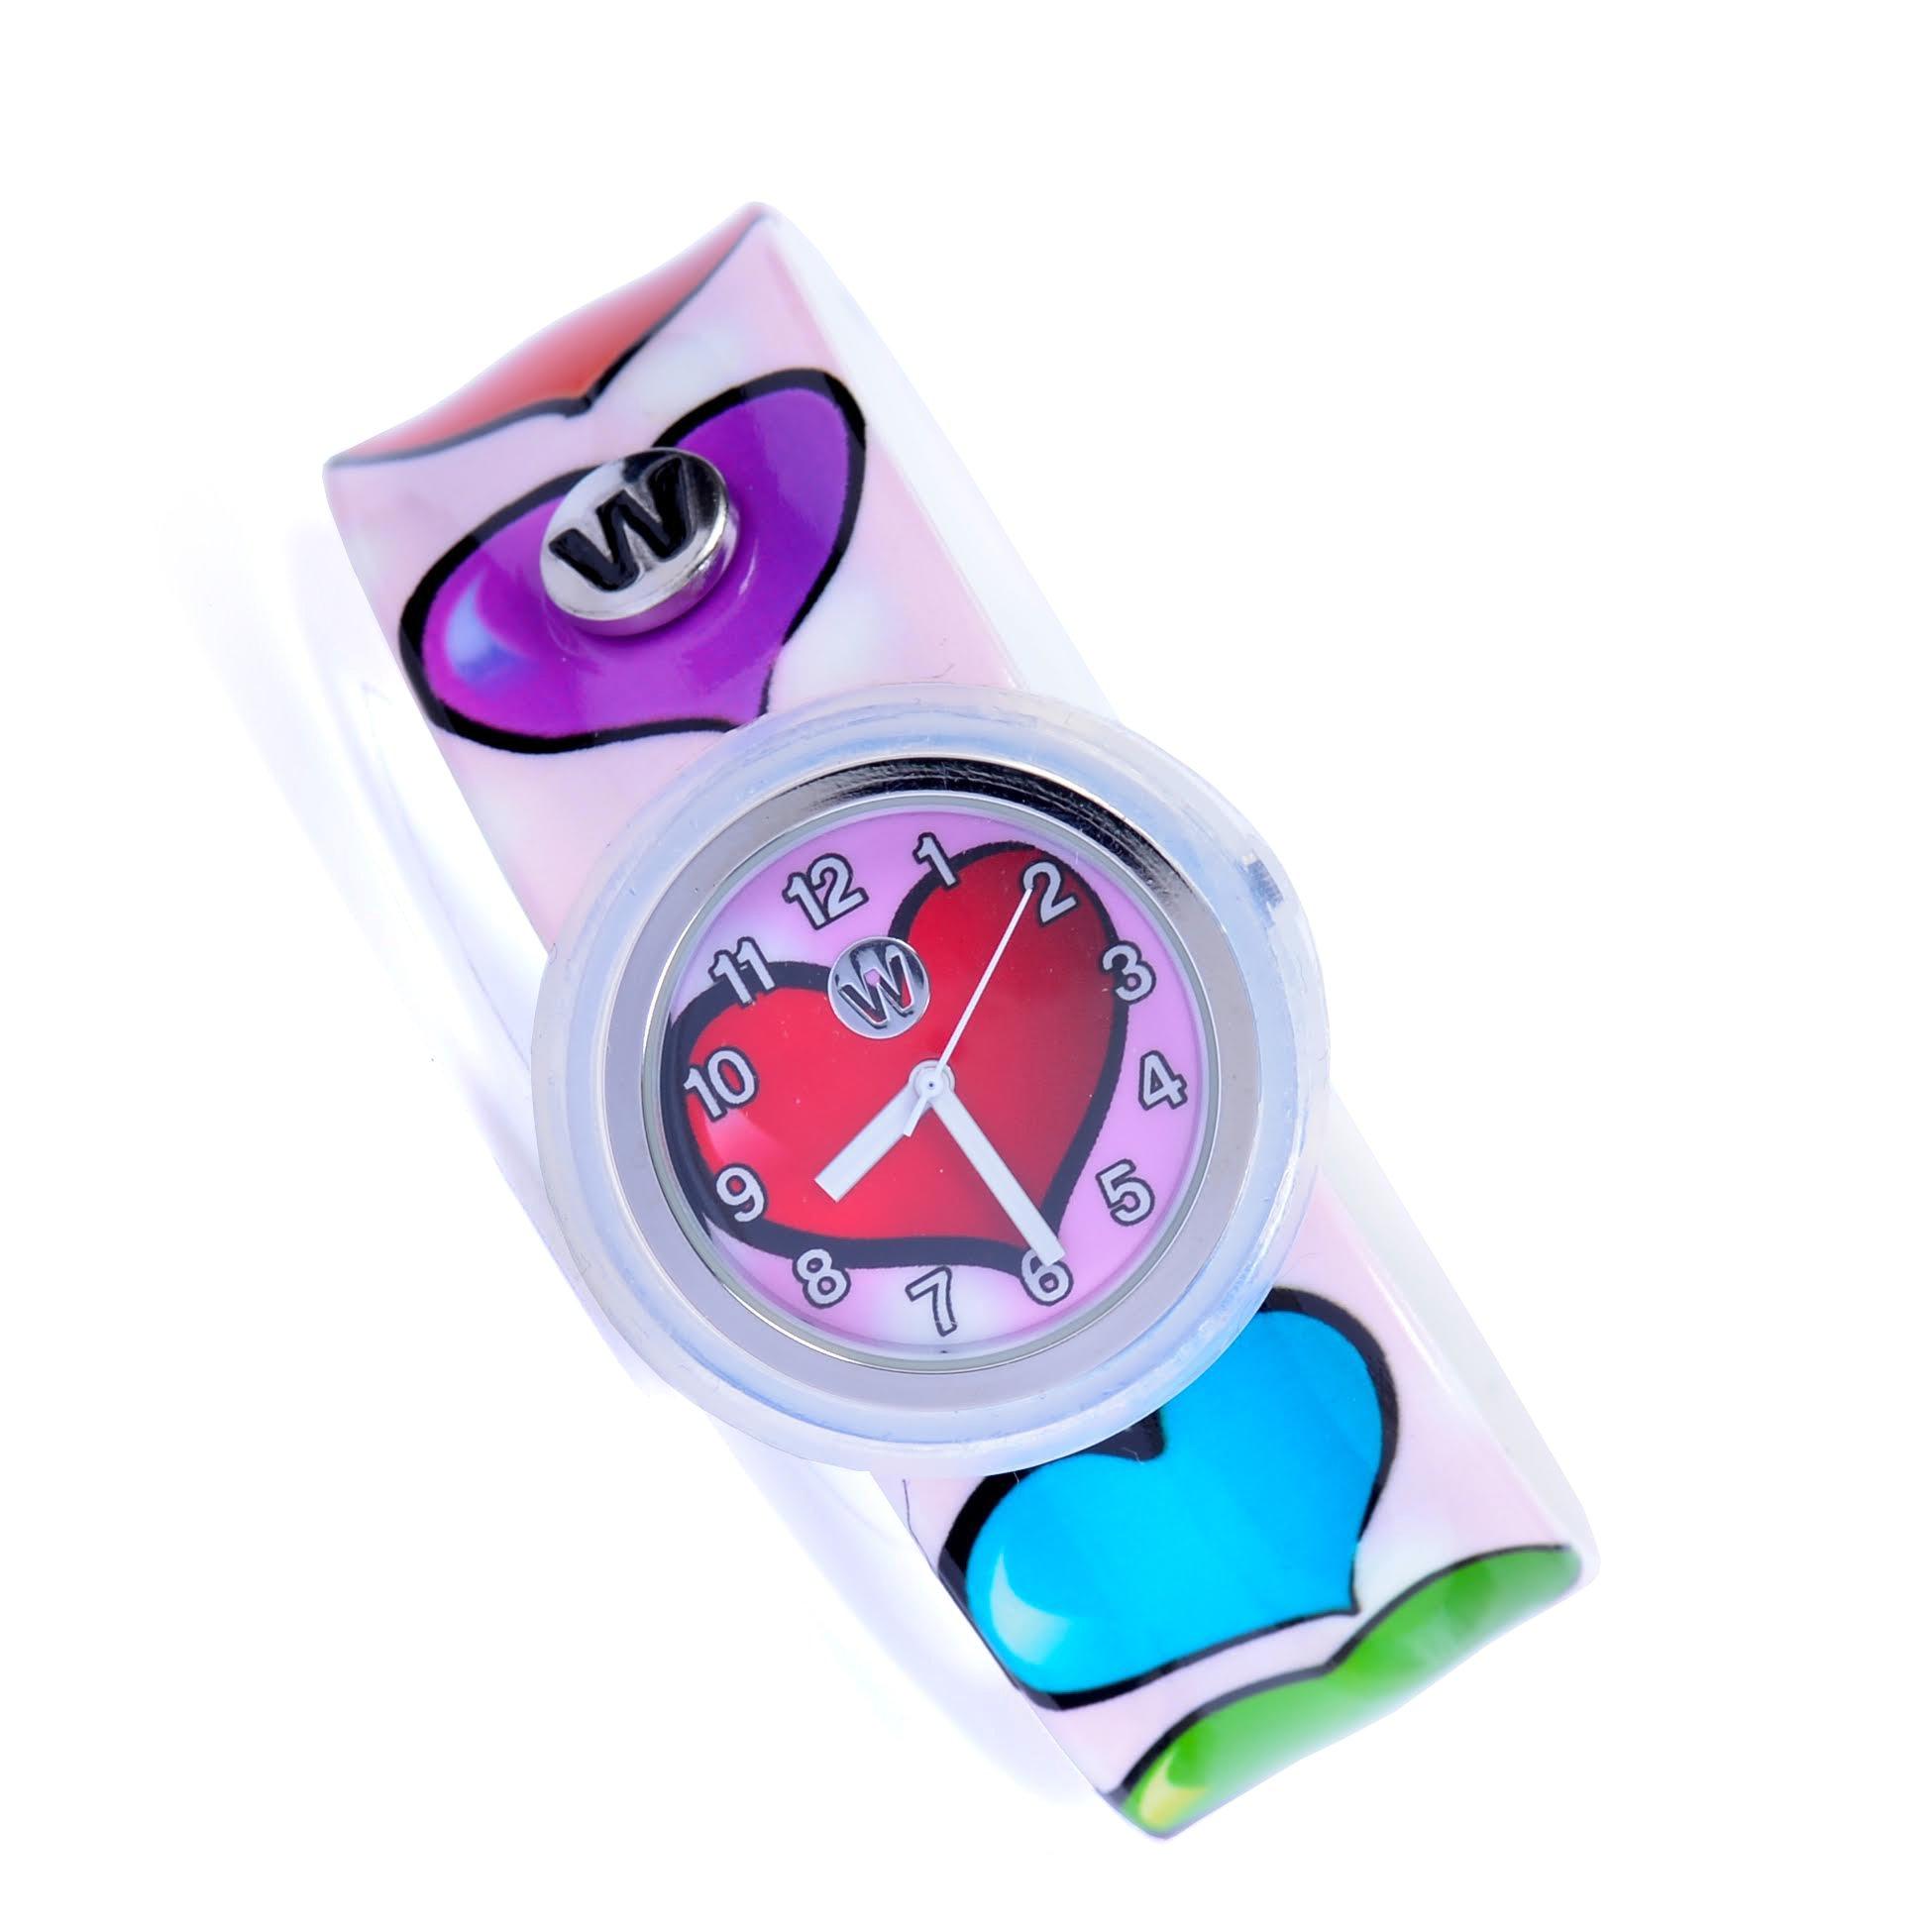 Watchitude Plunge Proof Slap Watch - Sweethearts - Kids Watch for Boys & Girls